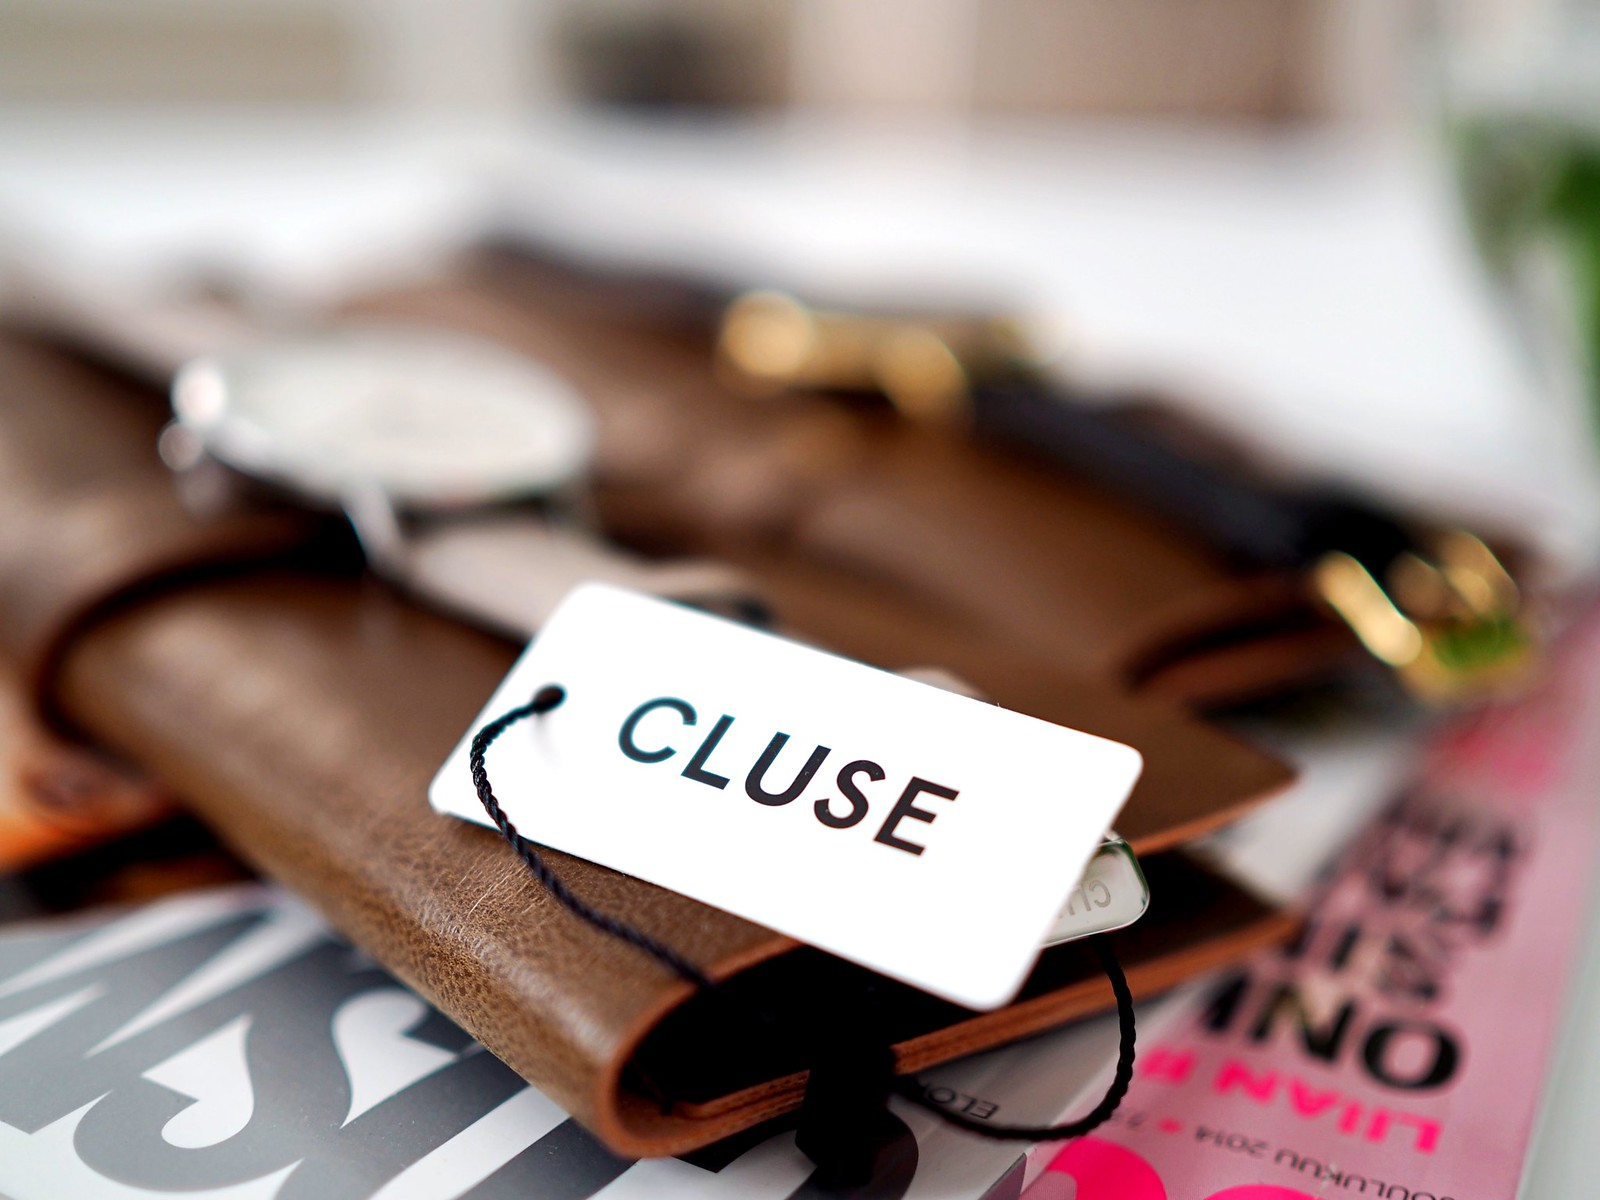 cluse_kellot_7